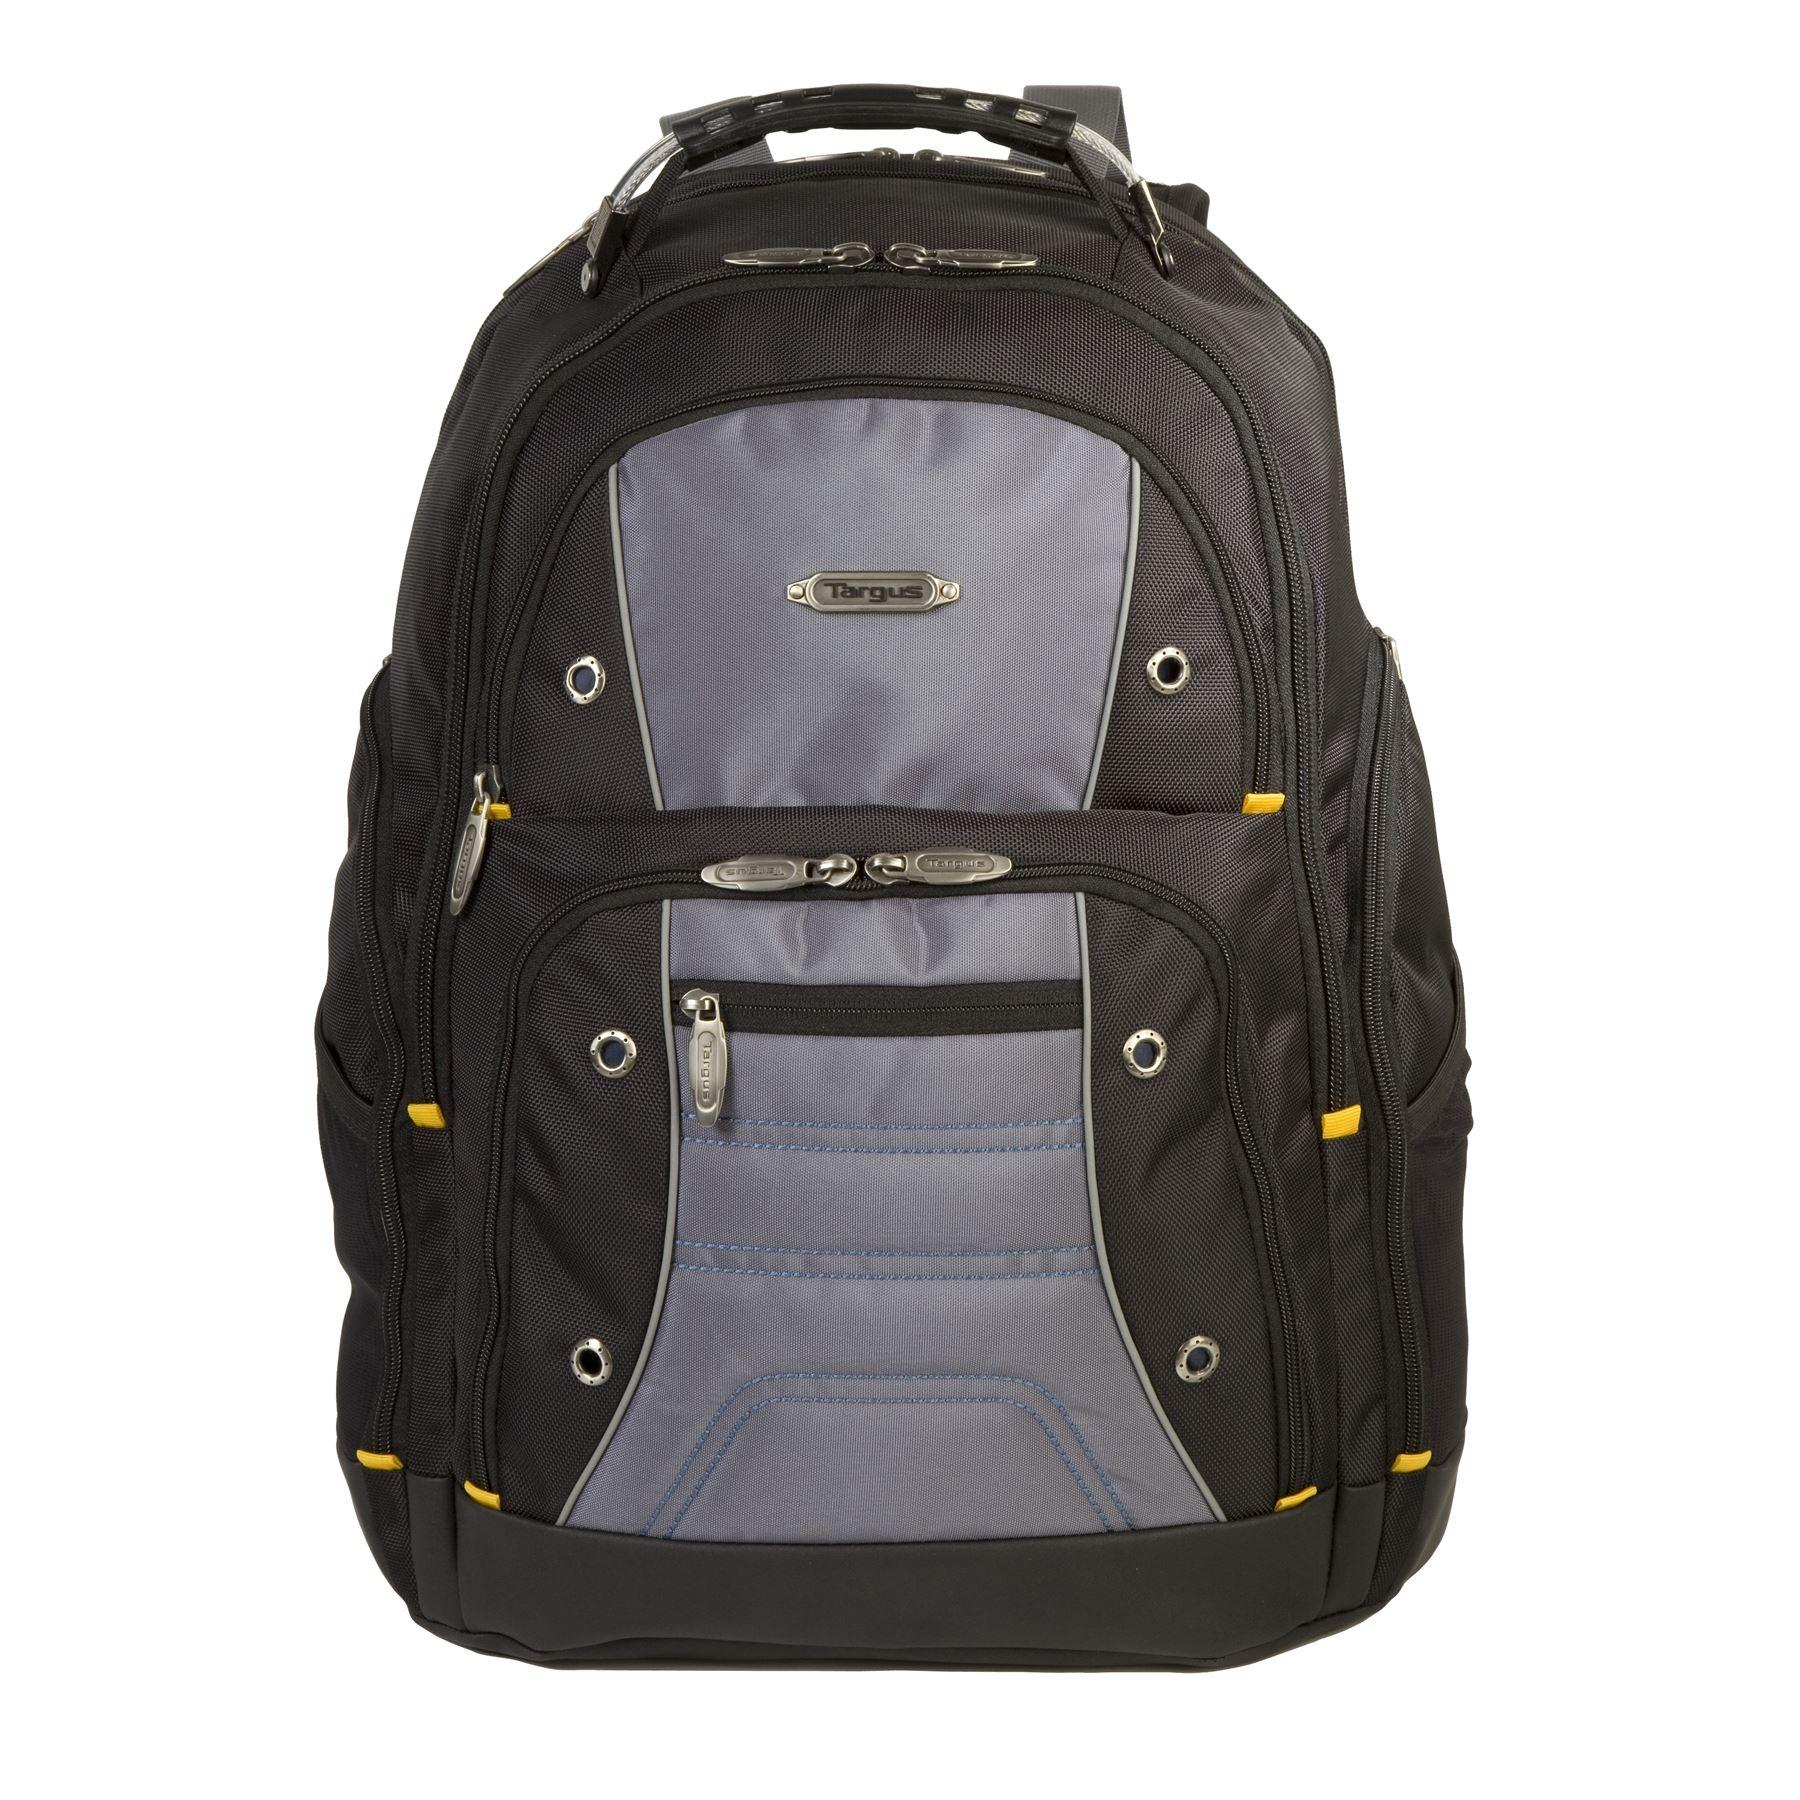 17 drifter ii laptop backpack tsb239us black gray backpacks